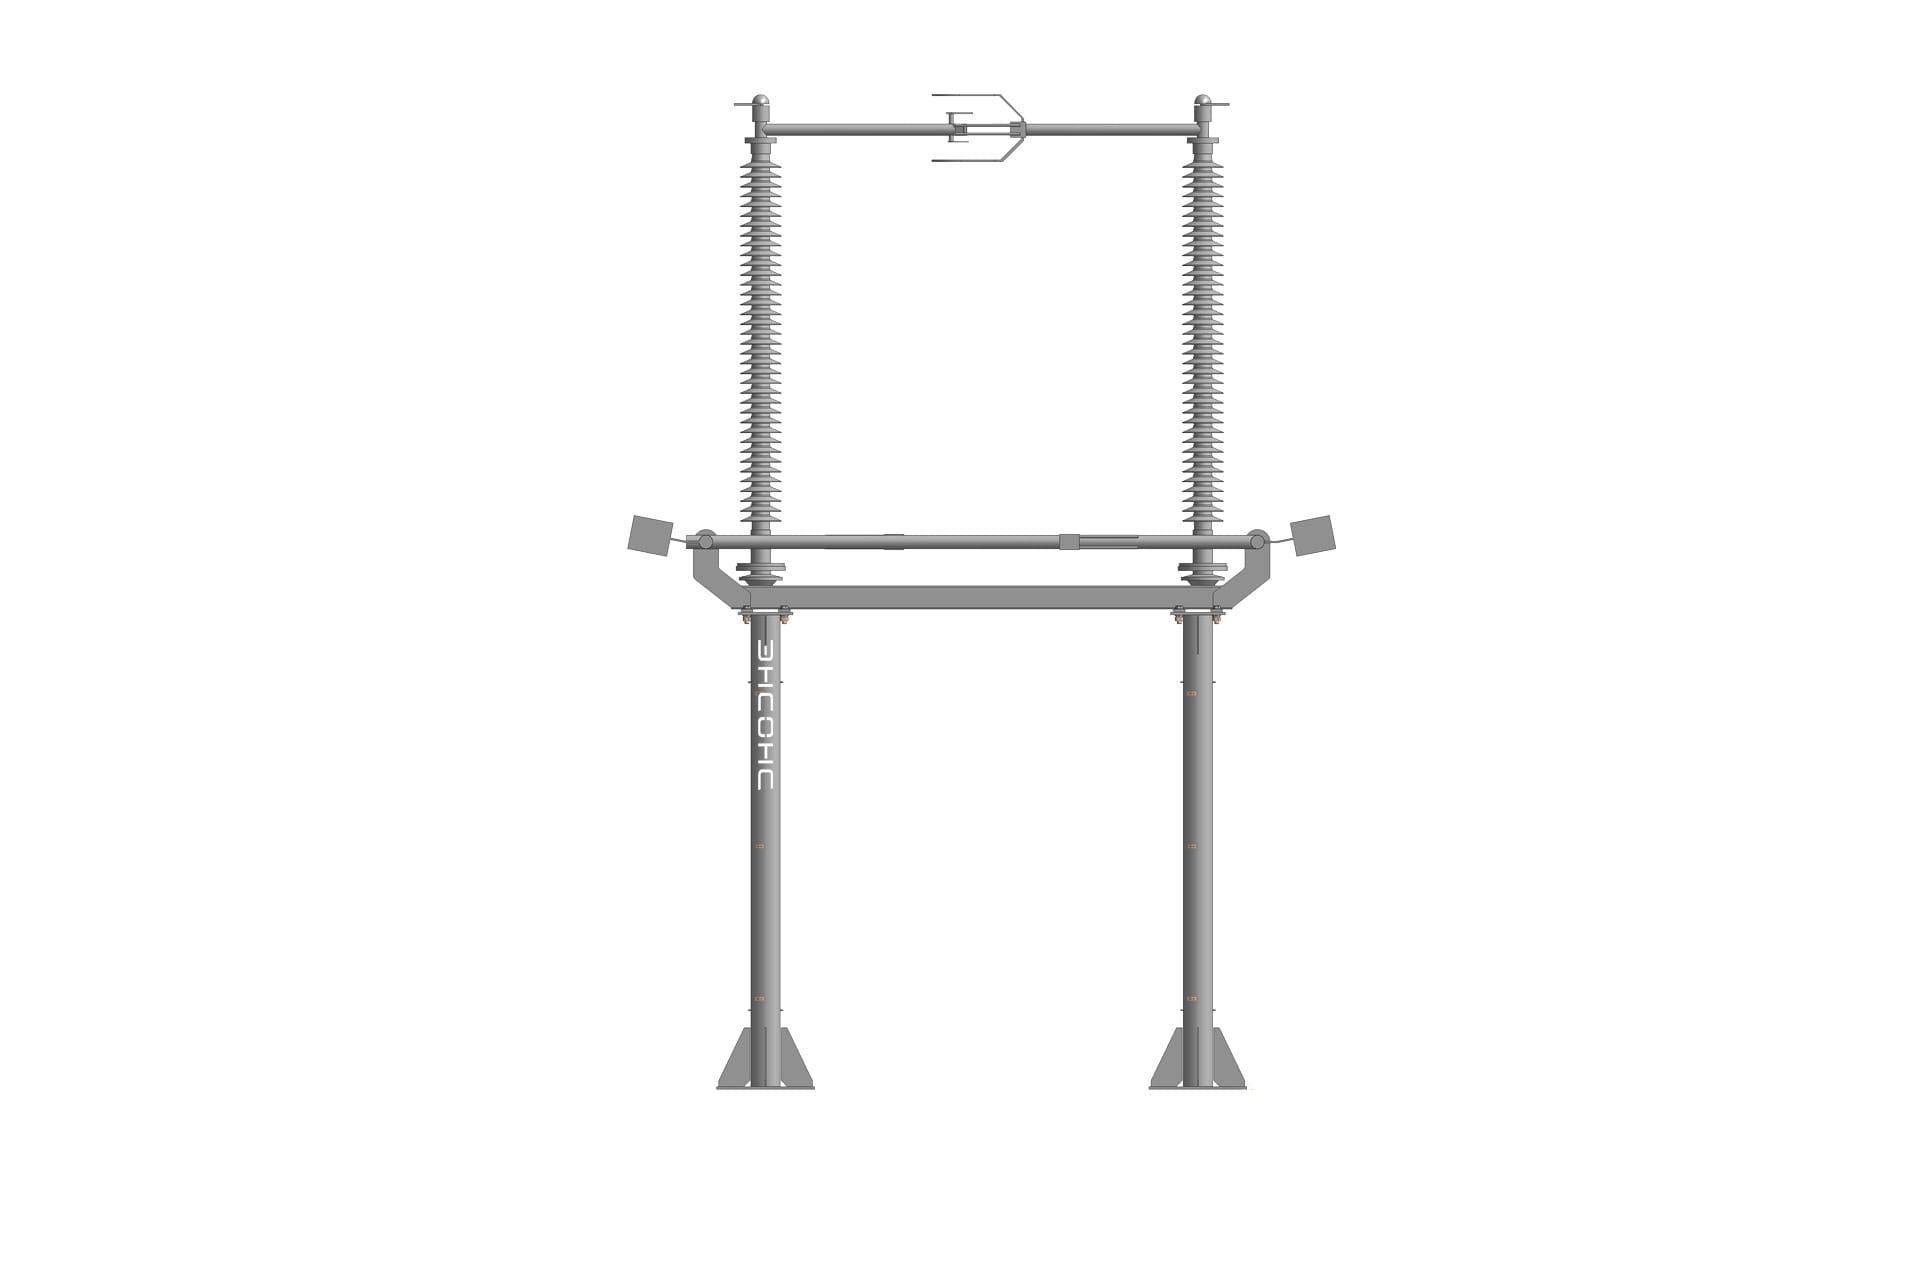 Ensons - Блок трехполюсного разъединителя 220 кВ